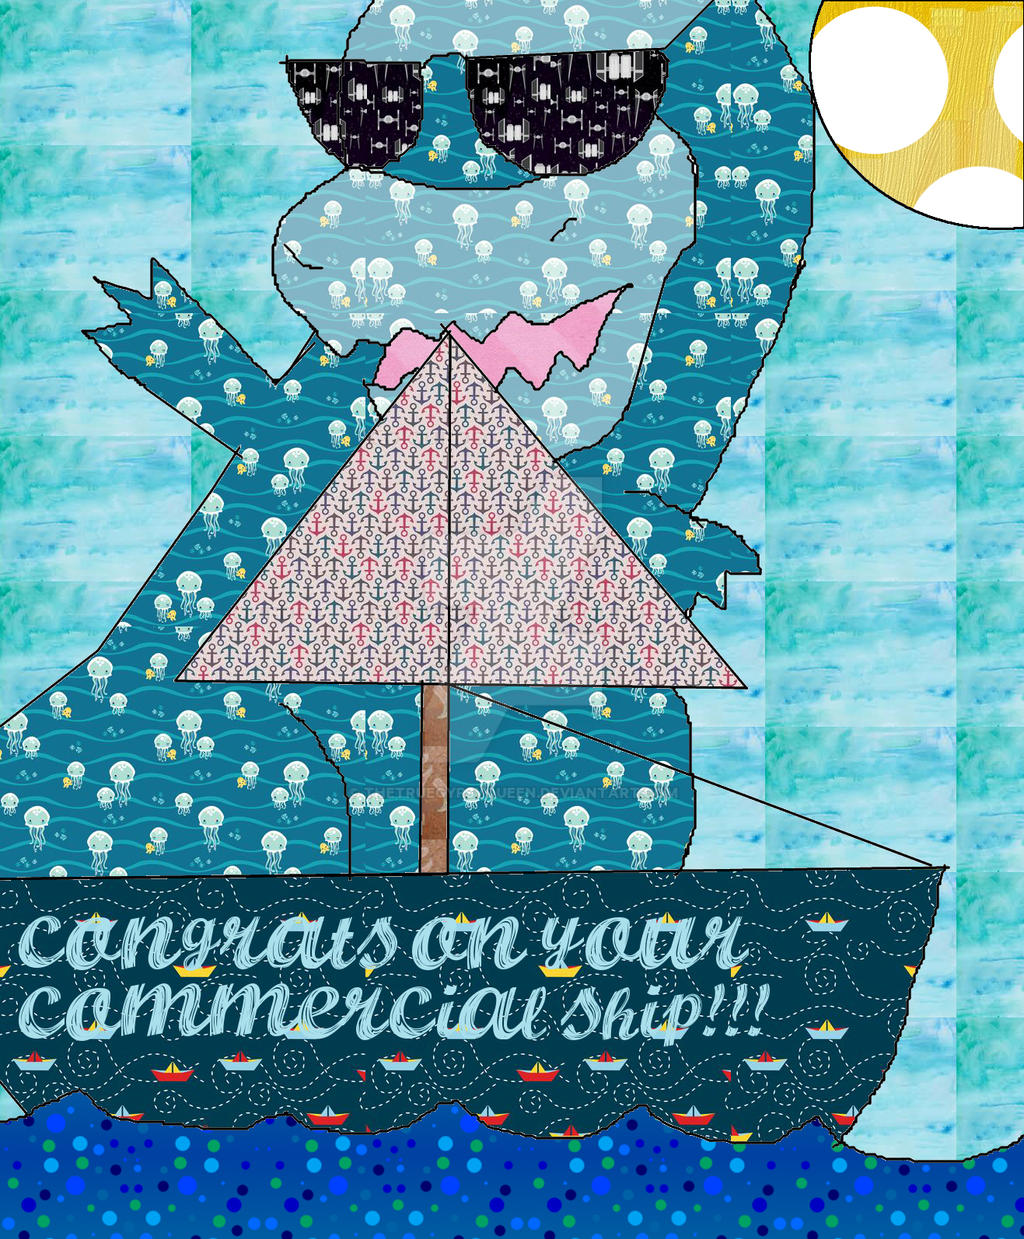 Commercial Ship Card by TheTrueGypsyQueen